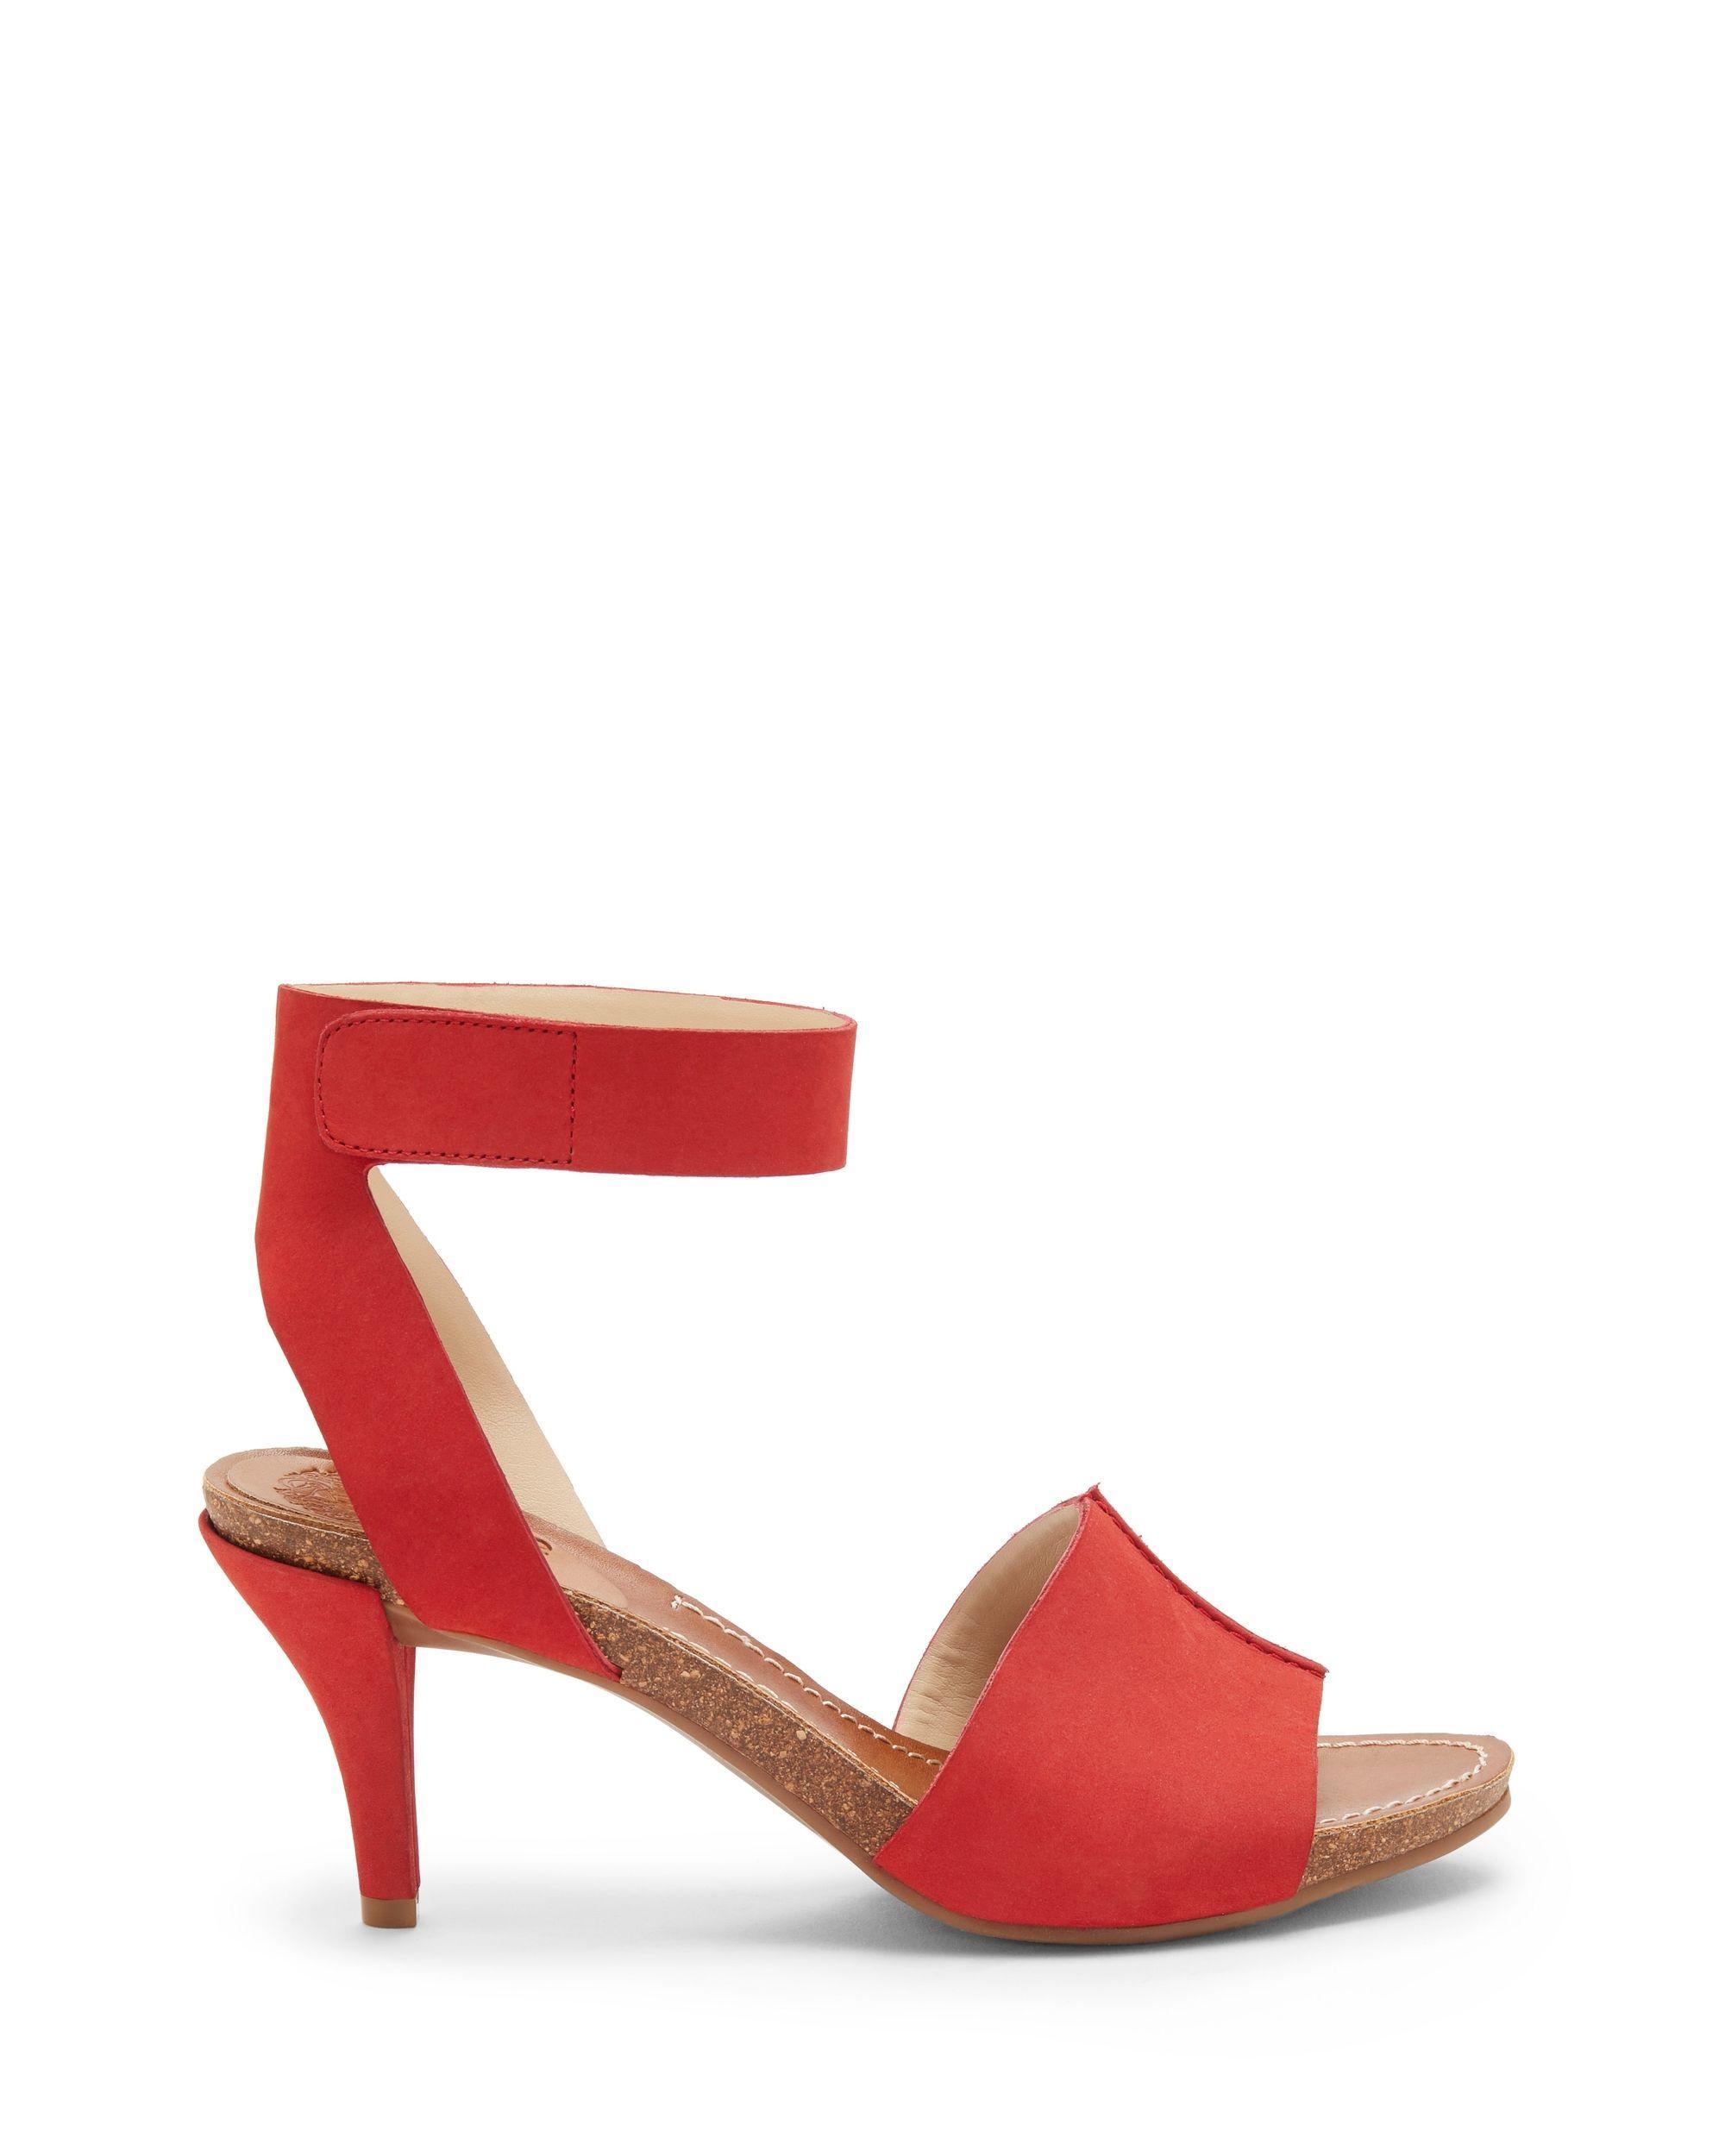 f64eec8de18 Lyst - Vince Camuto Odela – Two-strap Sandal in Red - Save 51%